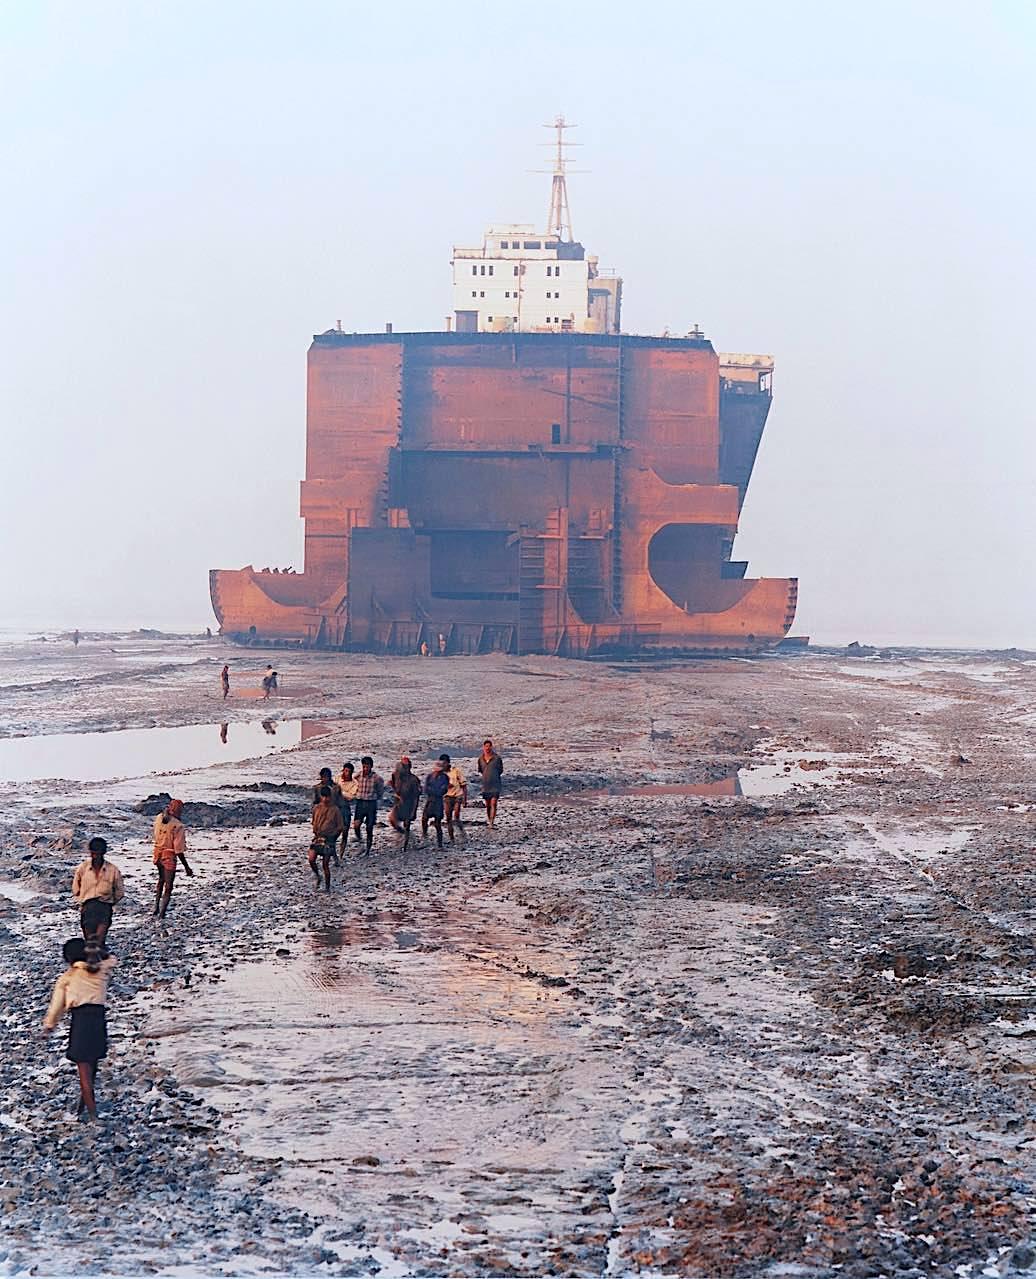 Edward Burtynsky Shipbreaking #21